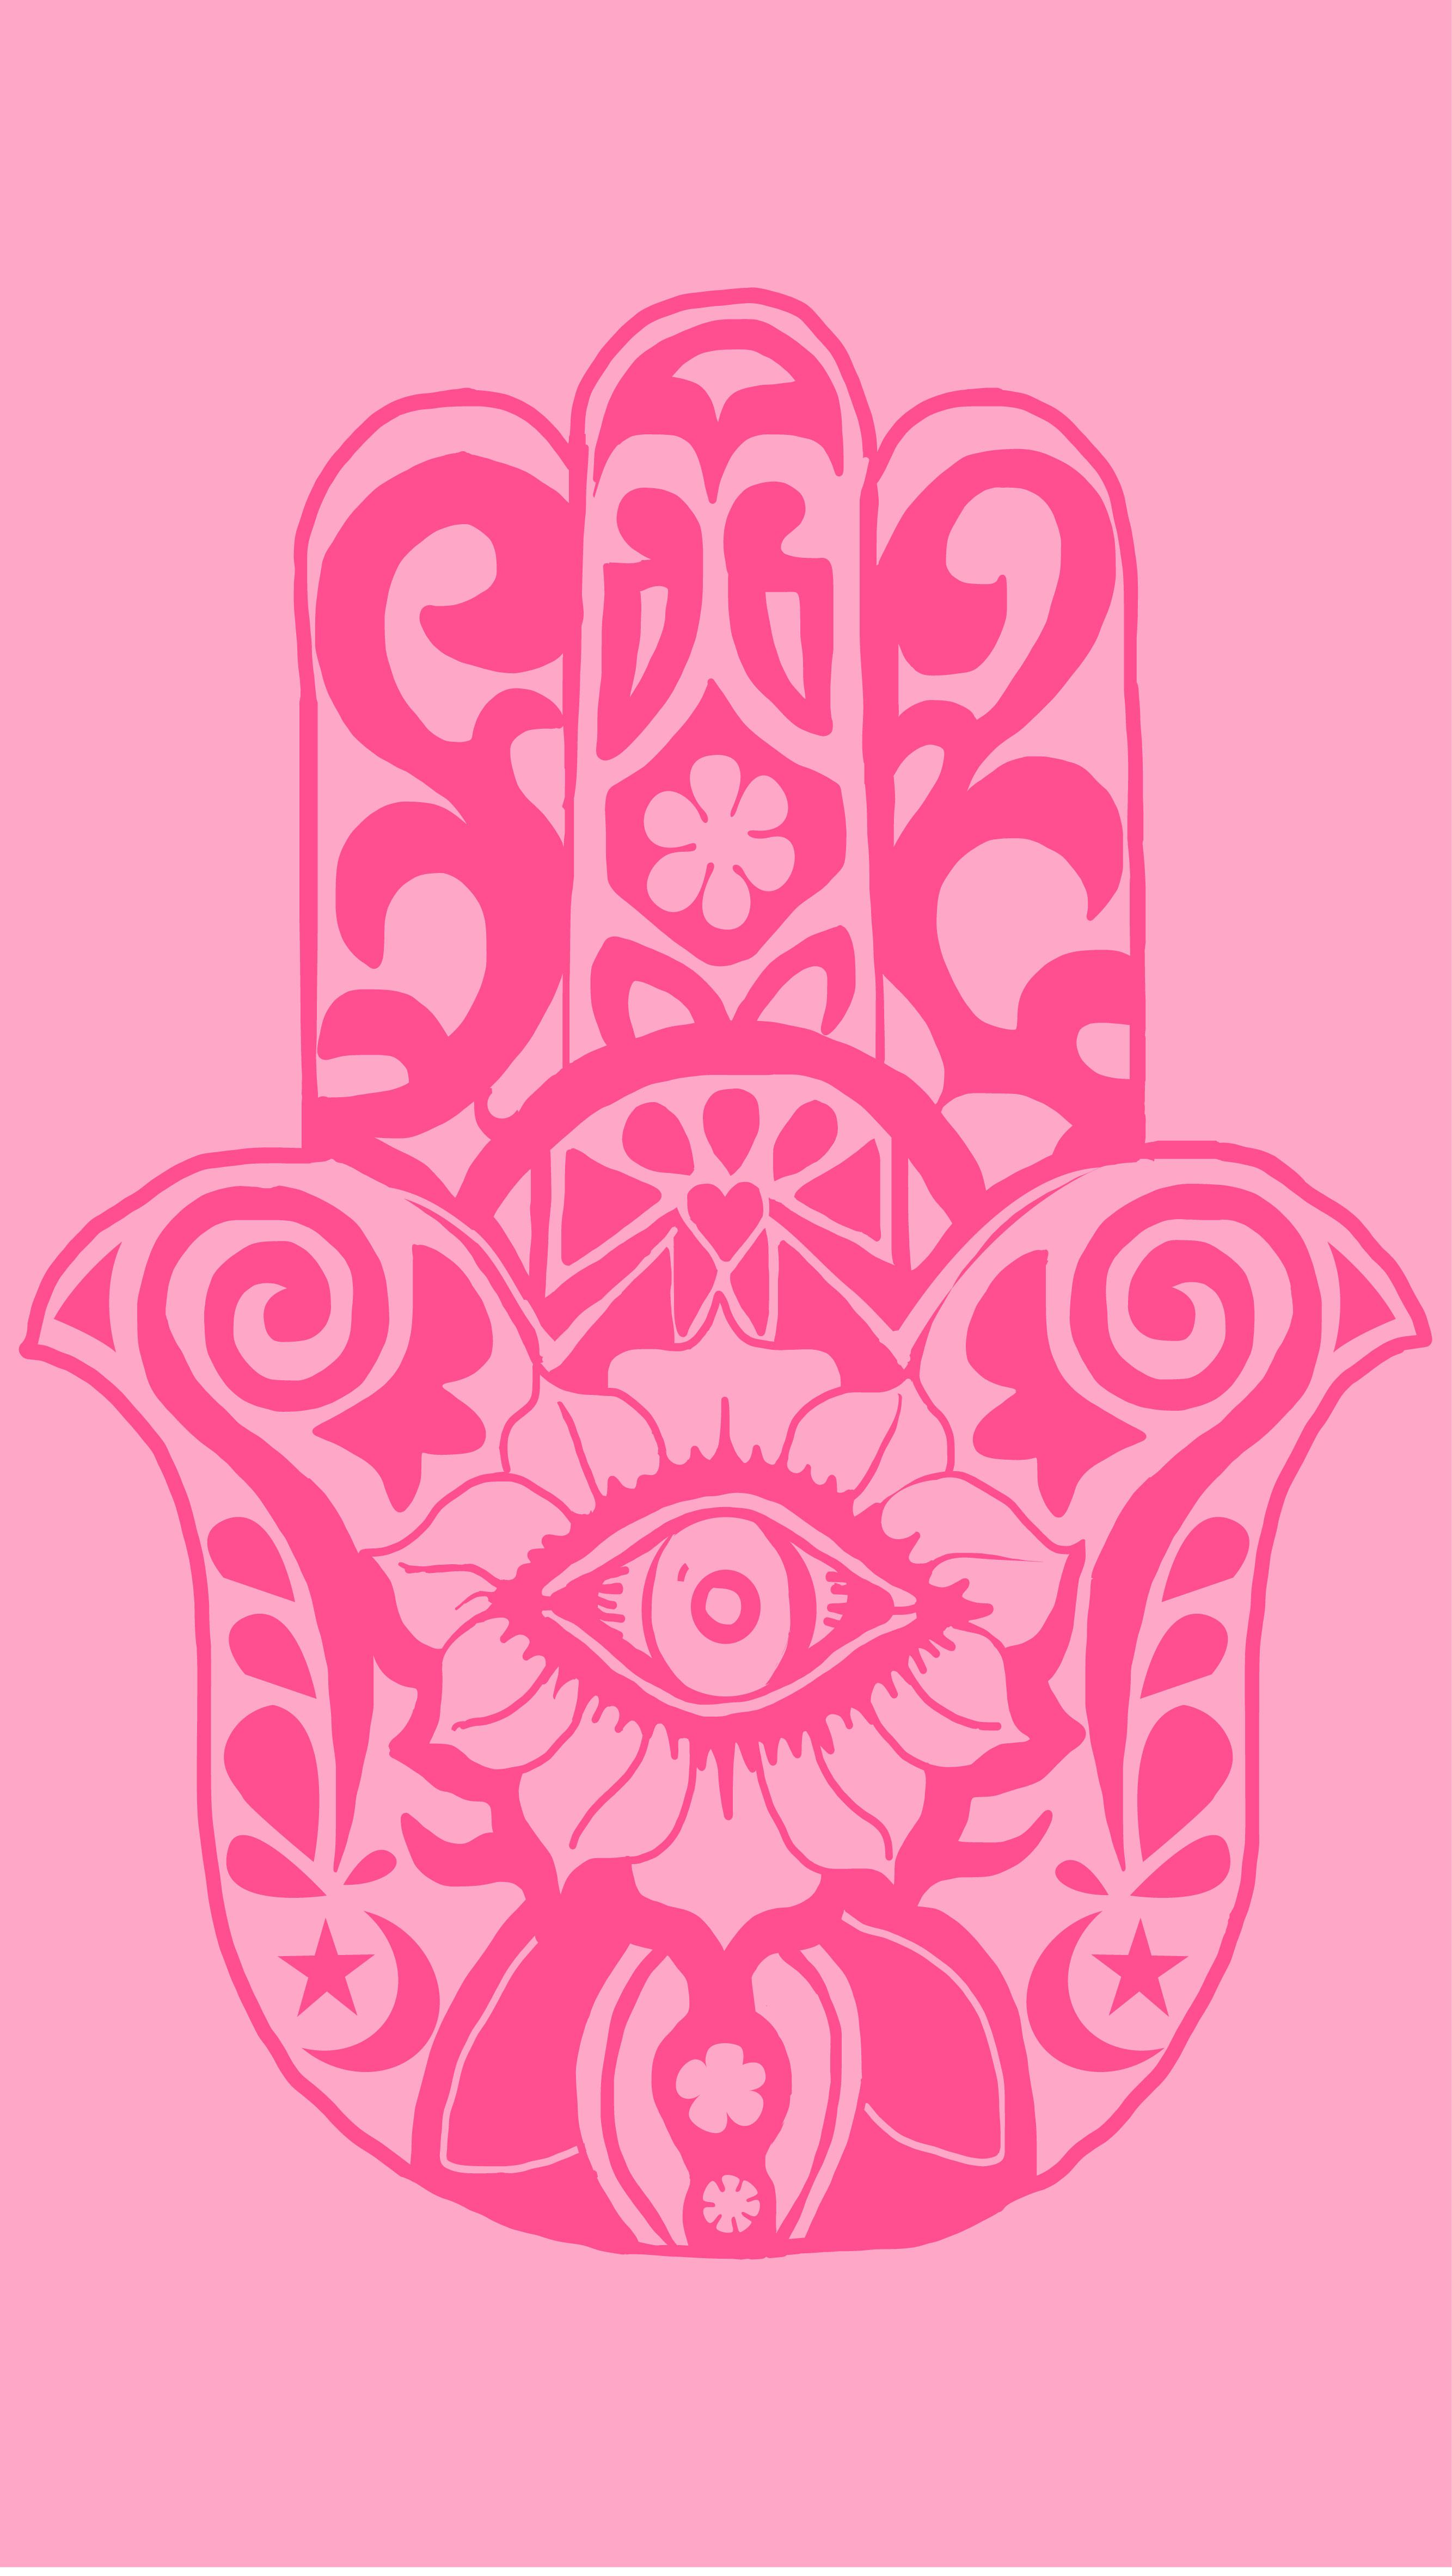 Iphone 5s Wallpaper Tumblr 5 2667x4733